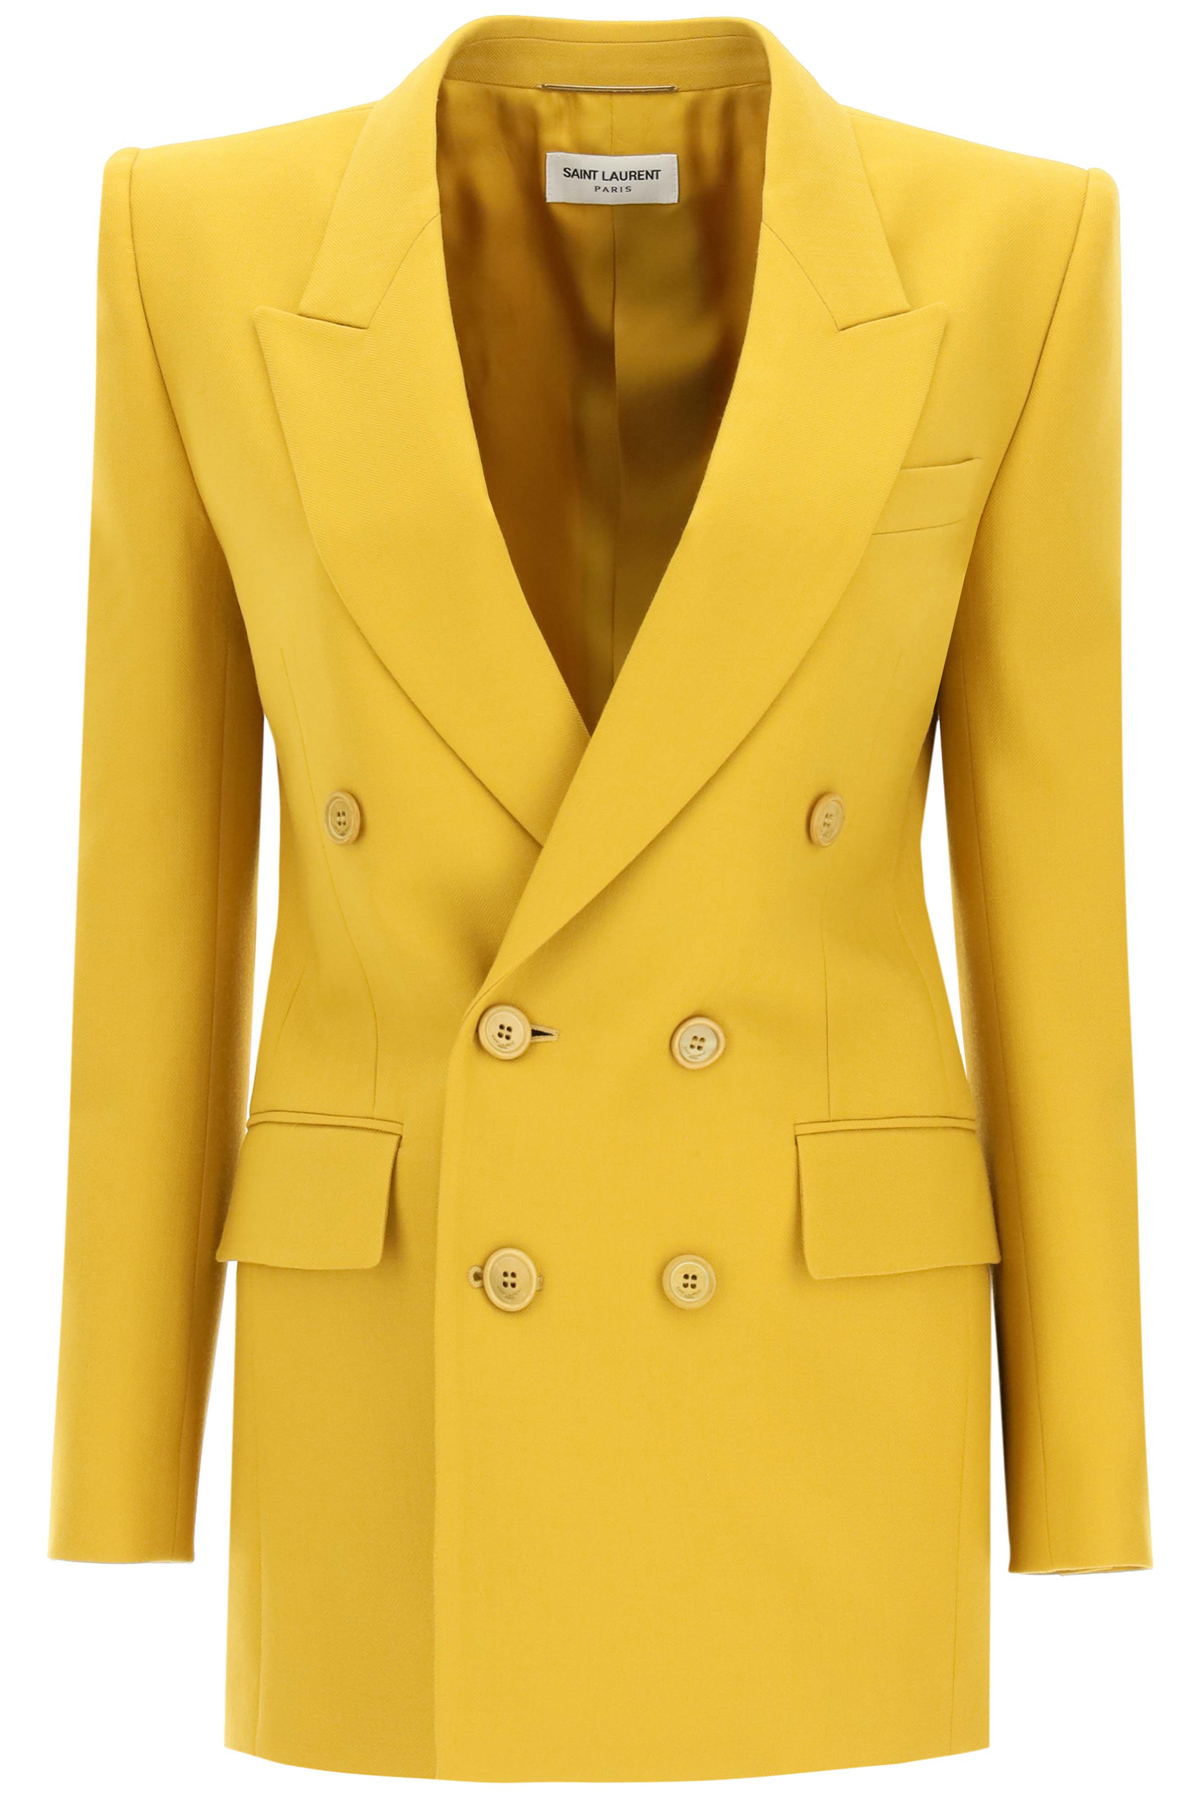 Saint laurent giacca doppio petto in lana chevron